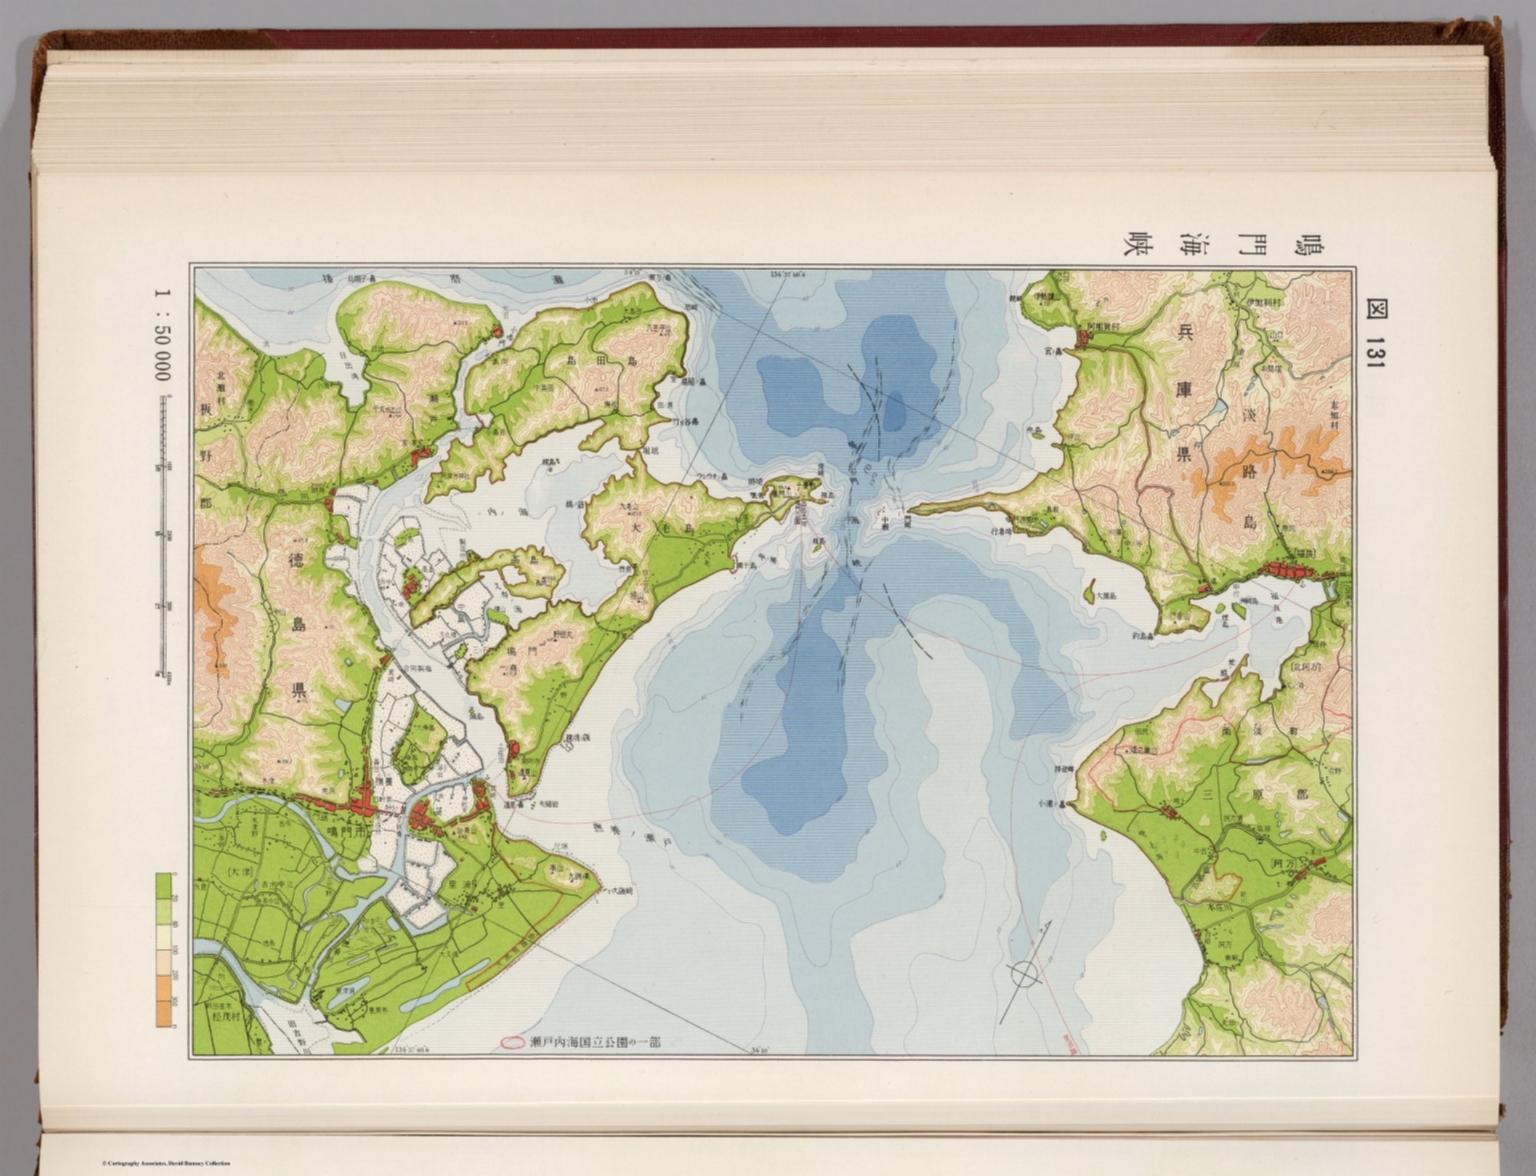 131 Naruto Strait, Japan - David Rumsey Historical Map